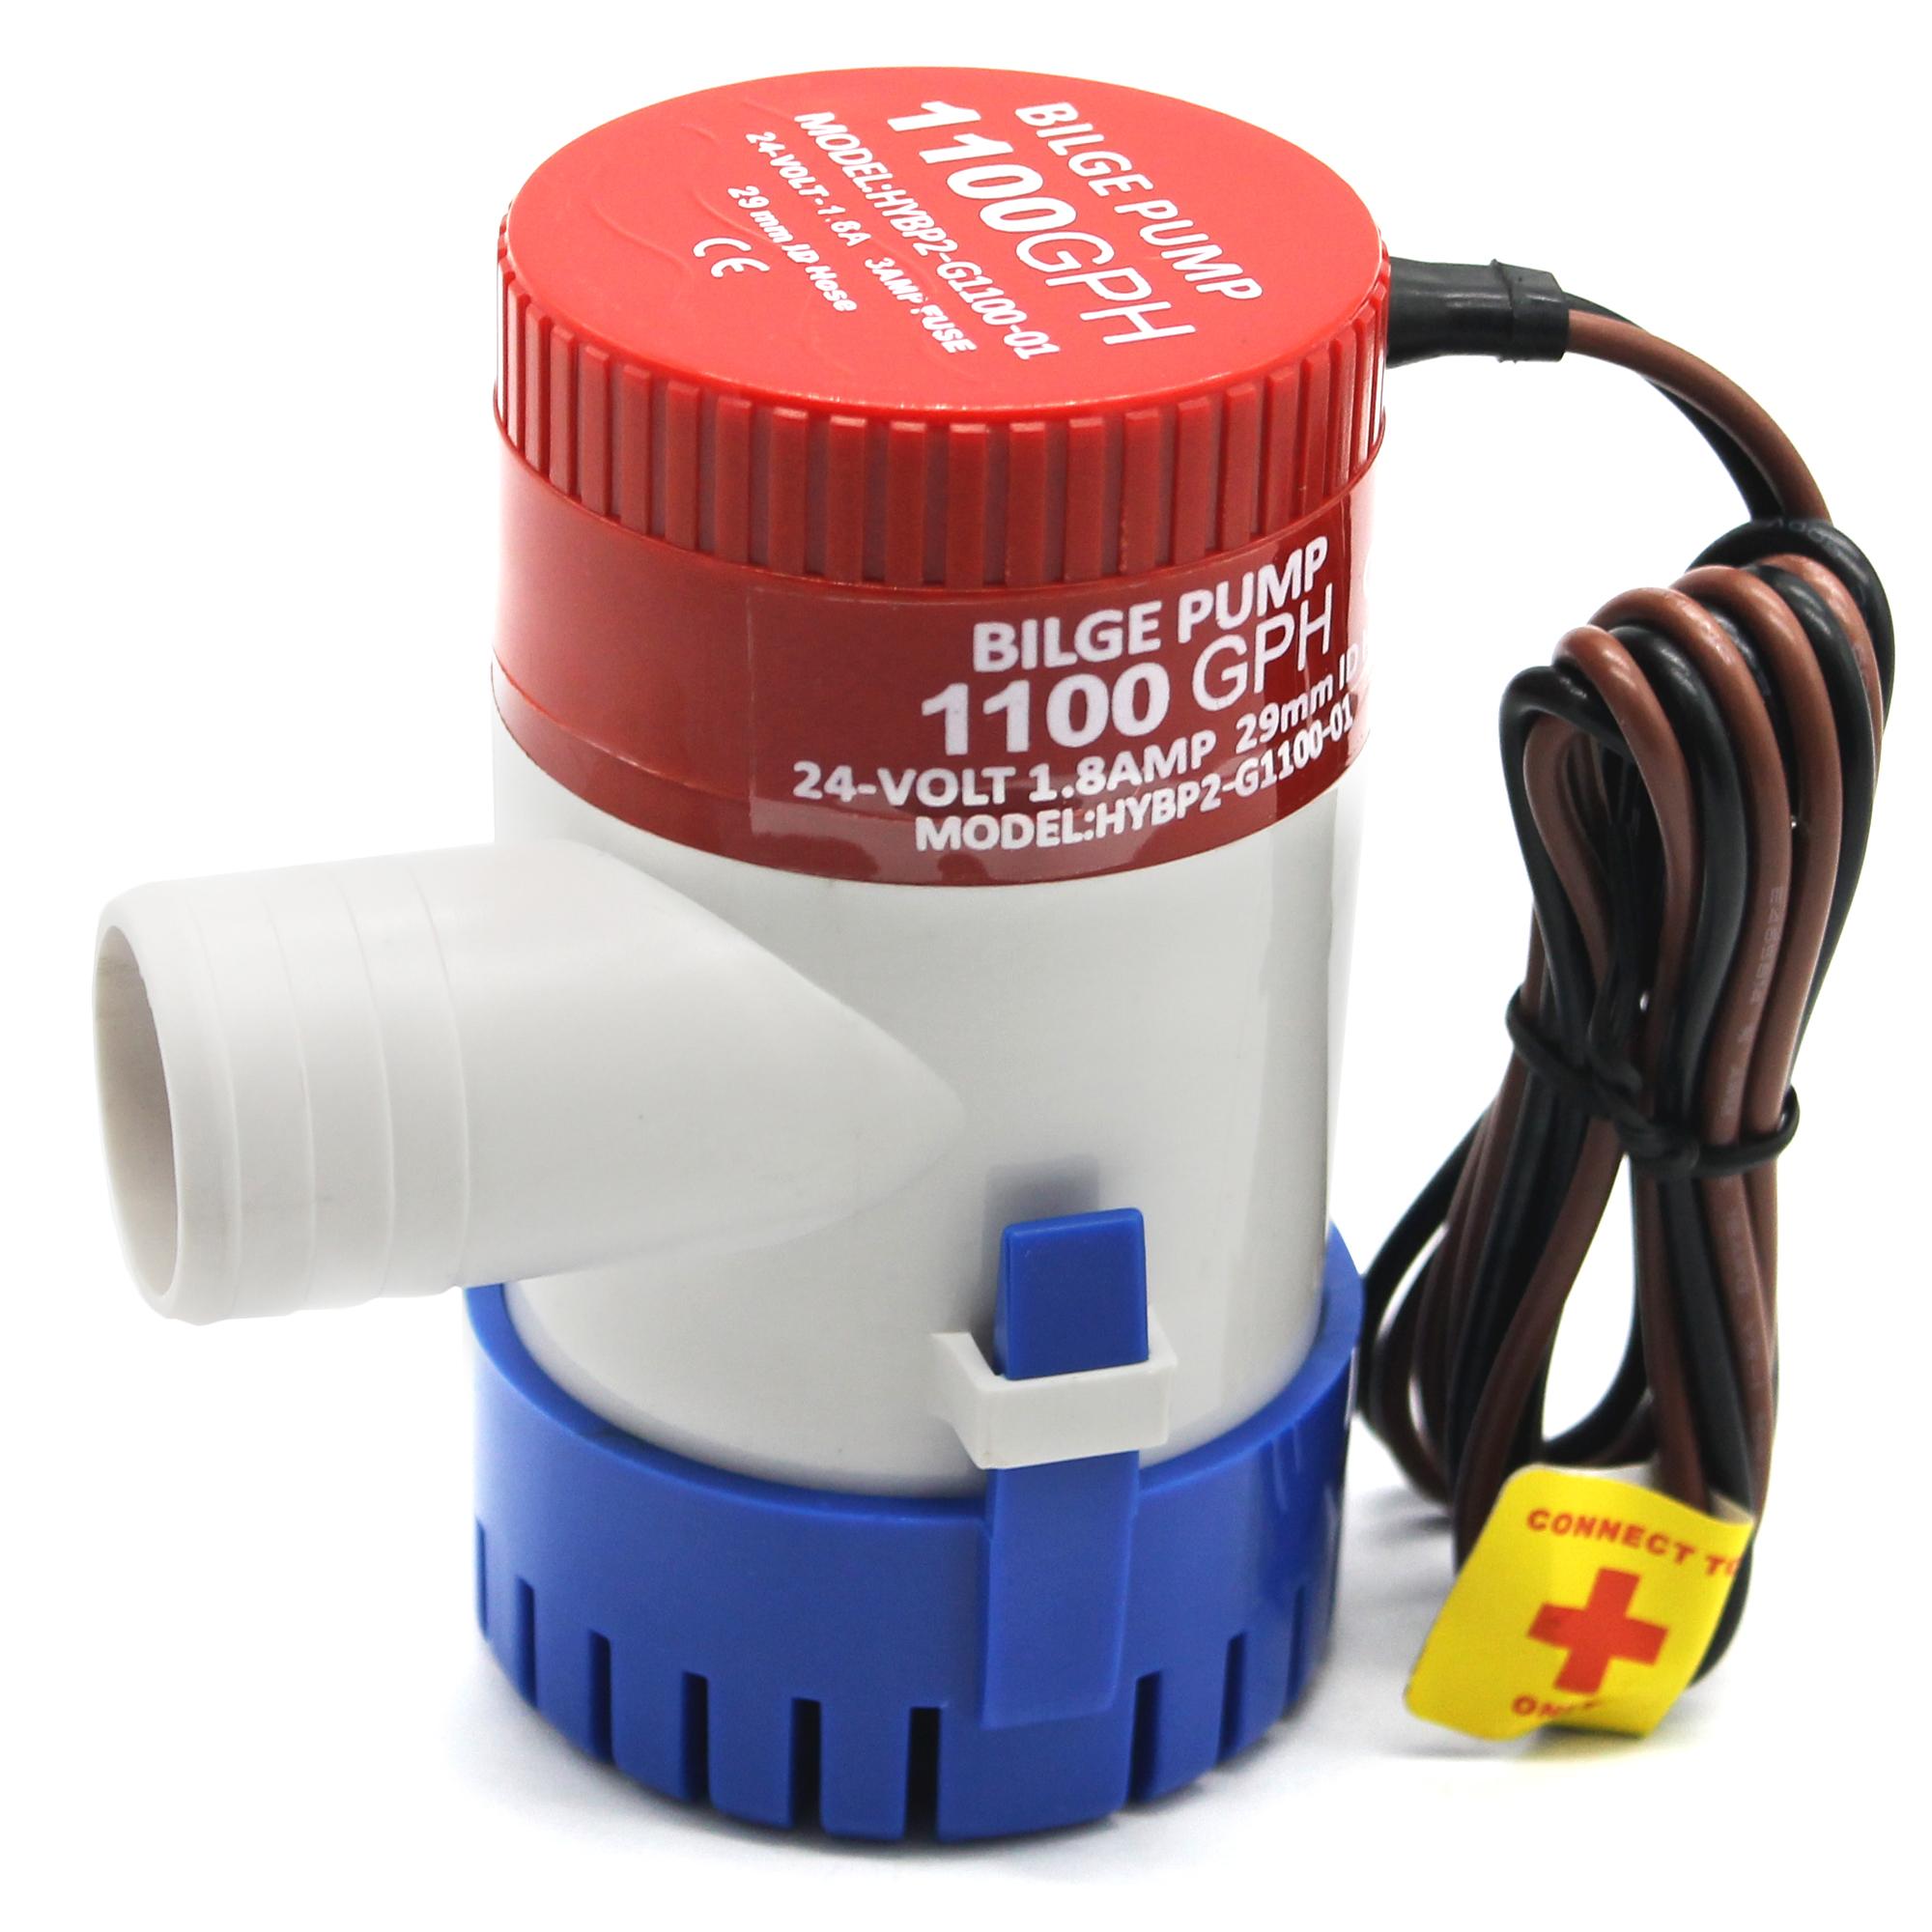 Iztor Marine Automatic Submersible Boat Bilge Water Pump 24V 1100 GPH Auto Float Switch